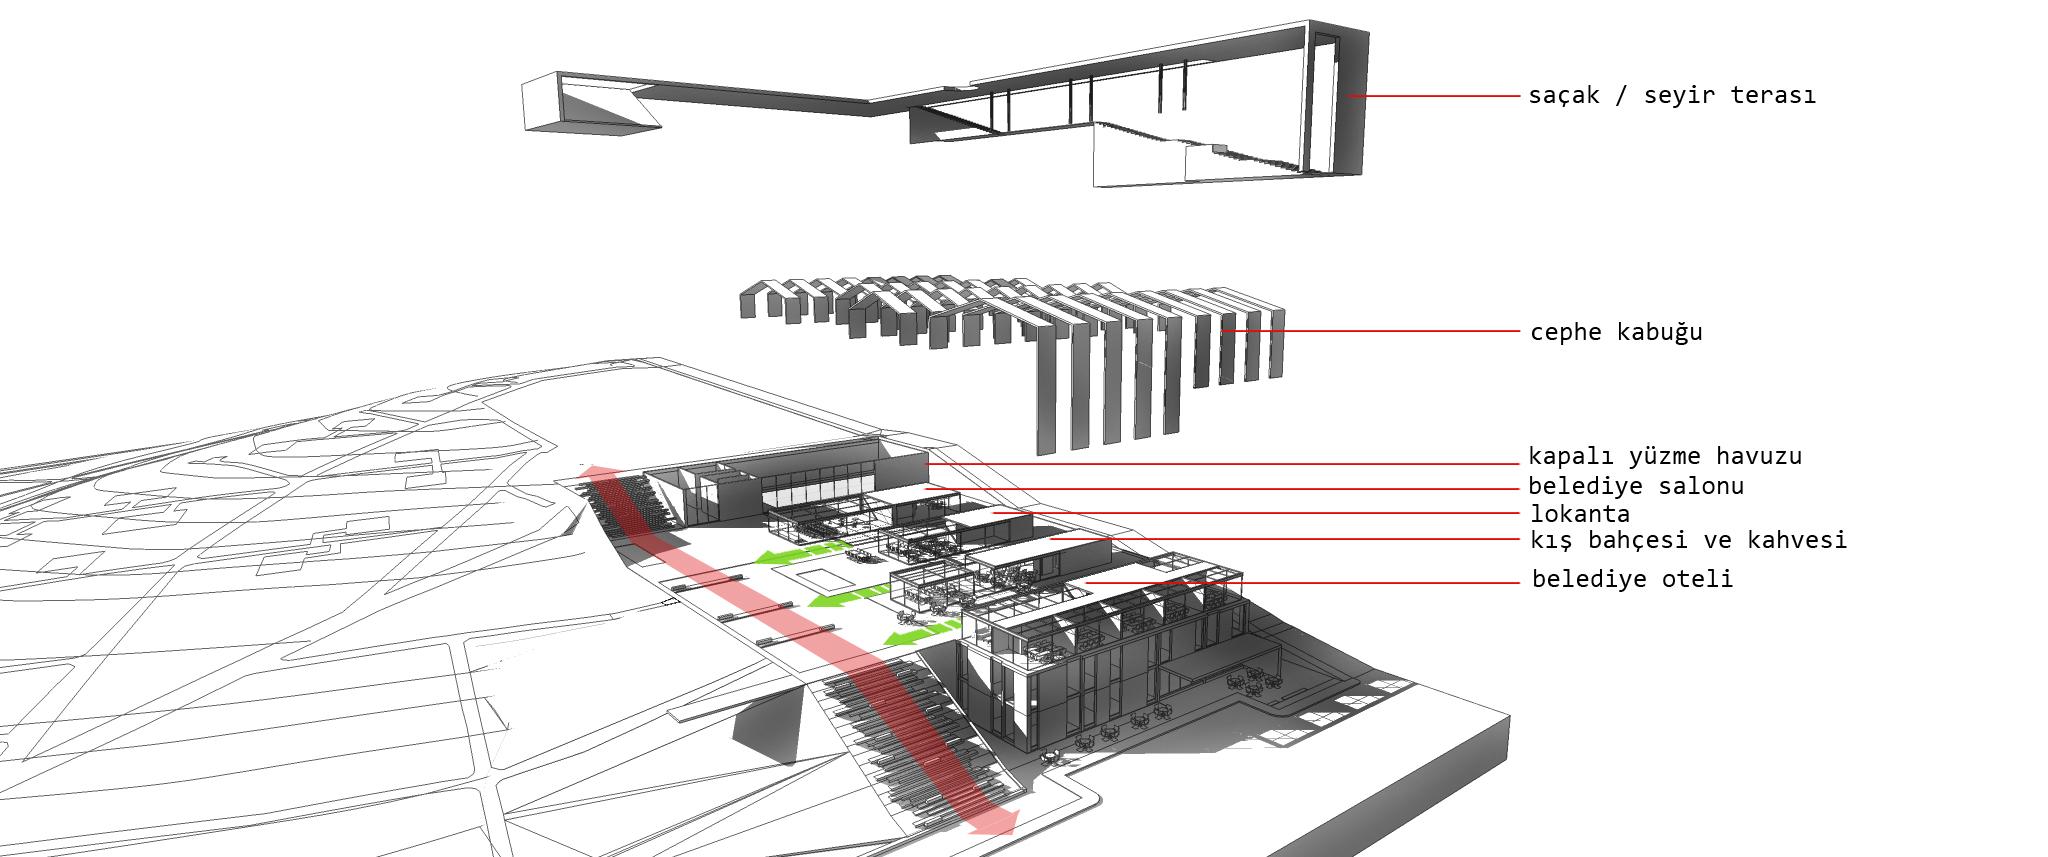 Idea 1105569 Erbaa Social Habitat By Studio Eikite